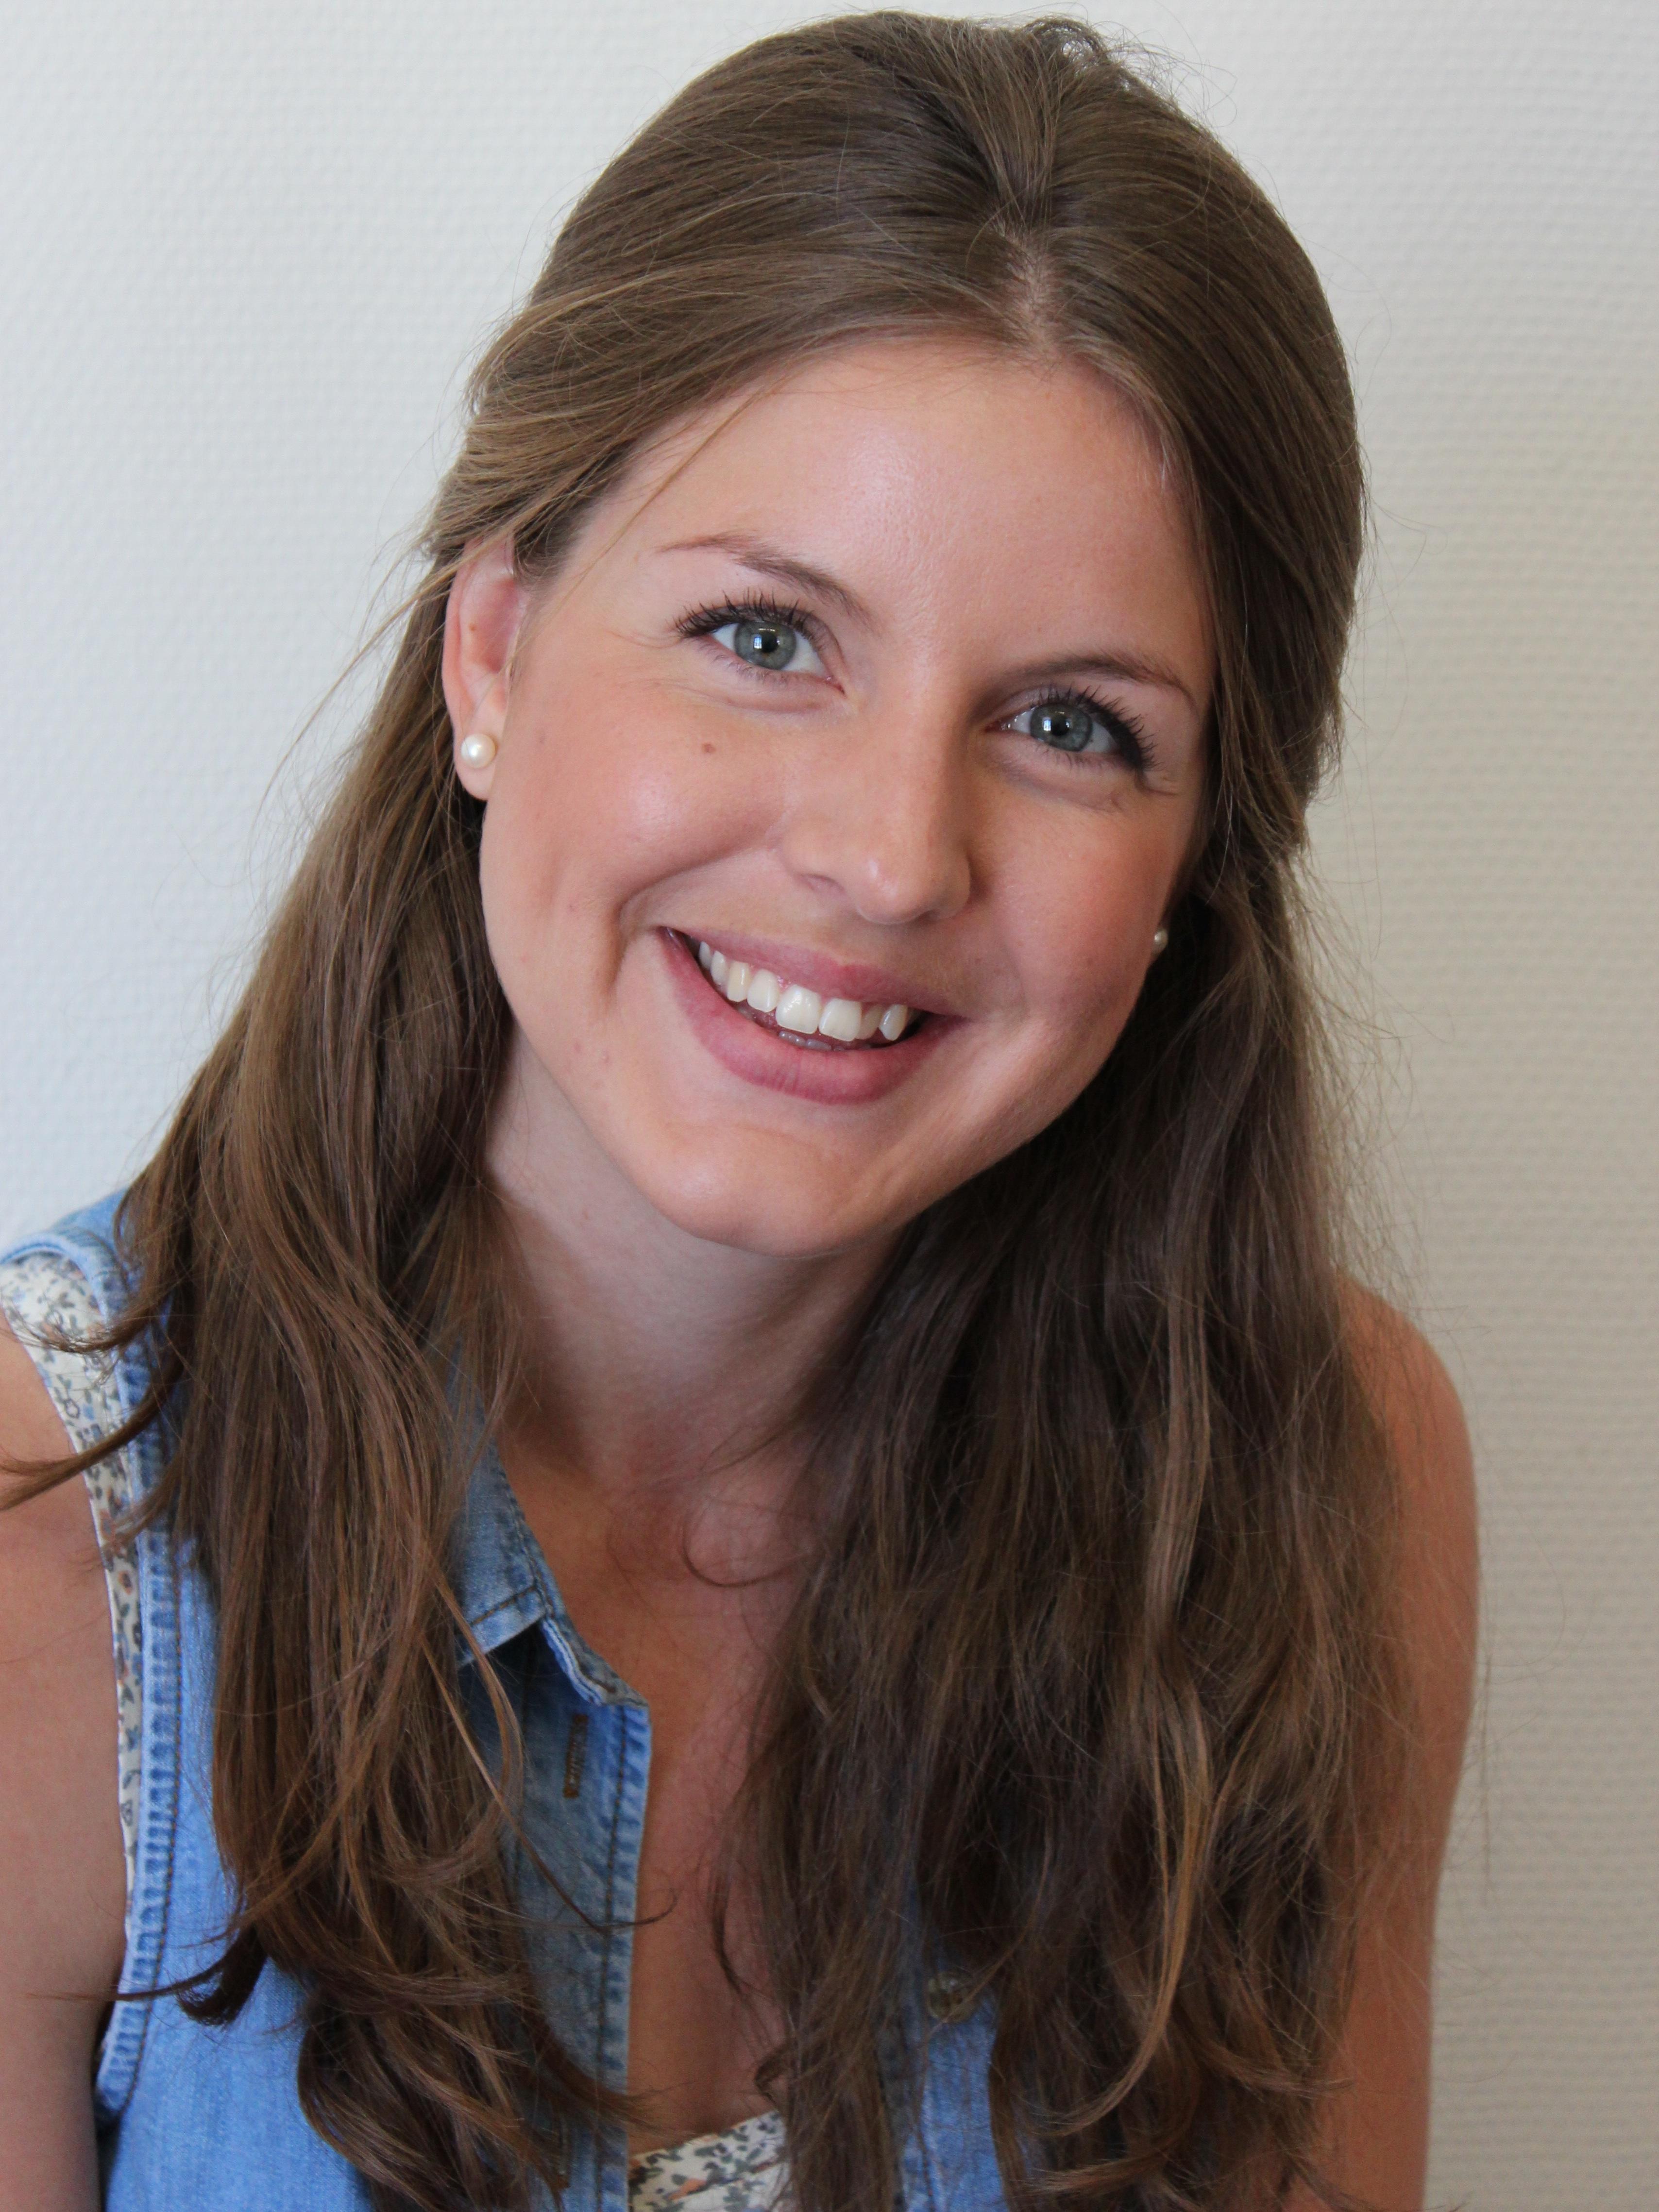 Louise Bengtsson Ma European Societal Security Research